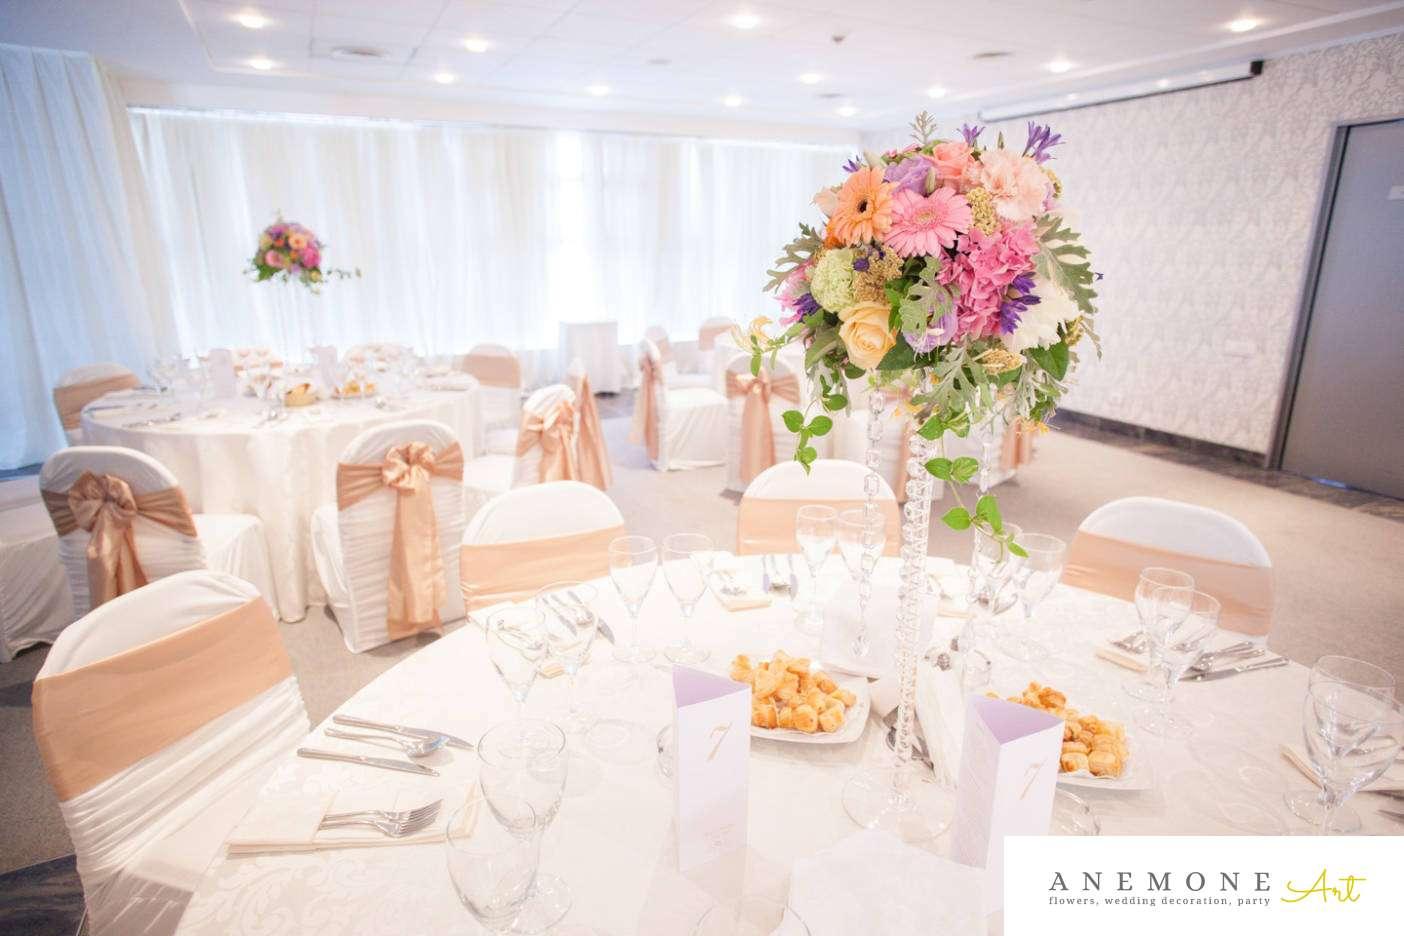 Poza, foto cu Flori de nunta decor masa, hotel continental in Arad, Timisoara, Oradea (wedding flowers, bouquets) nunta Arad, Timisoara, Oradea